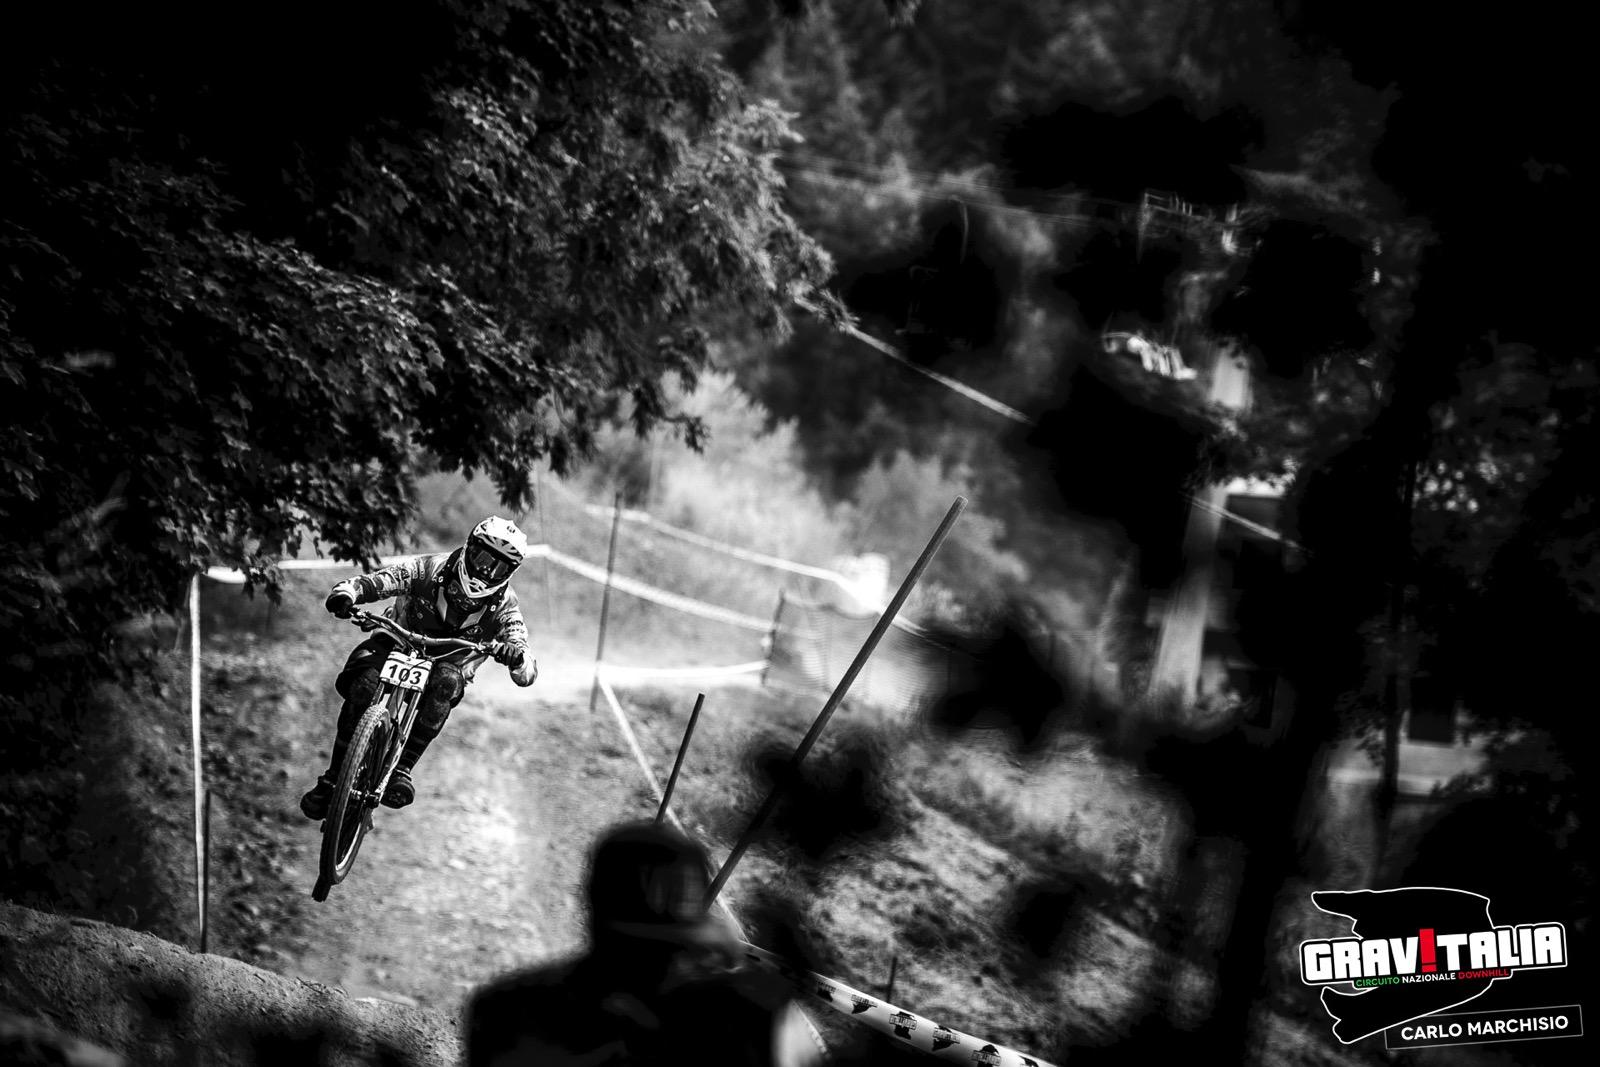 PhotoCarloMarchisio_GIT2015_CampionatiItaliani_Sestola_084